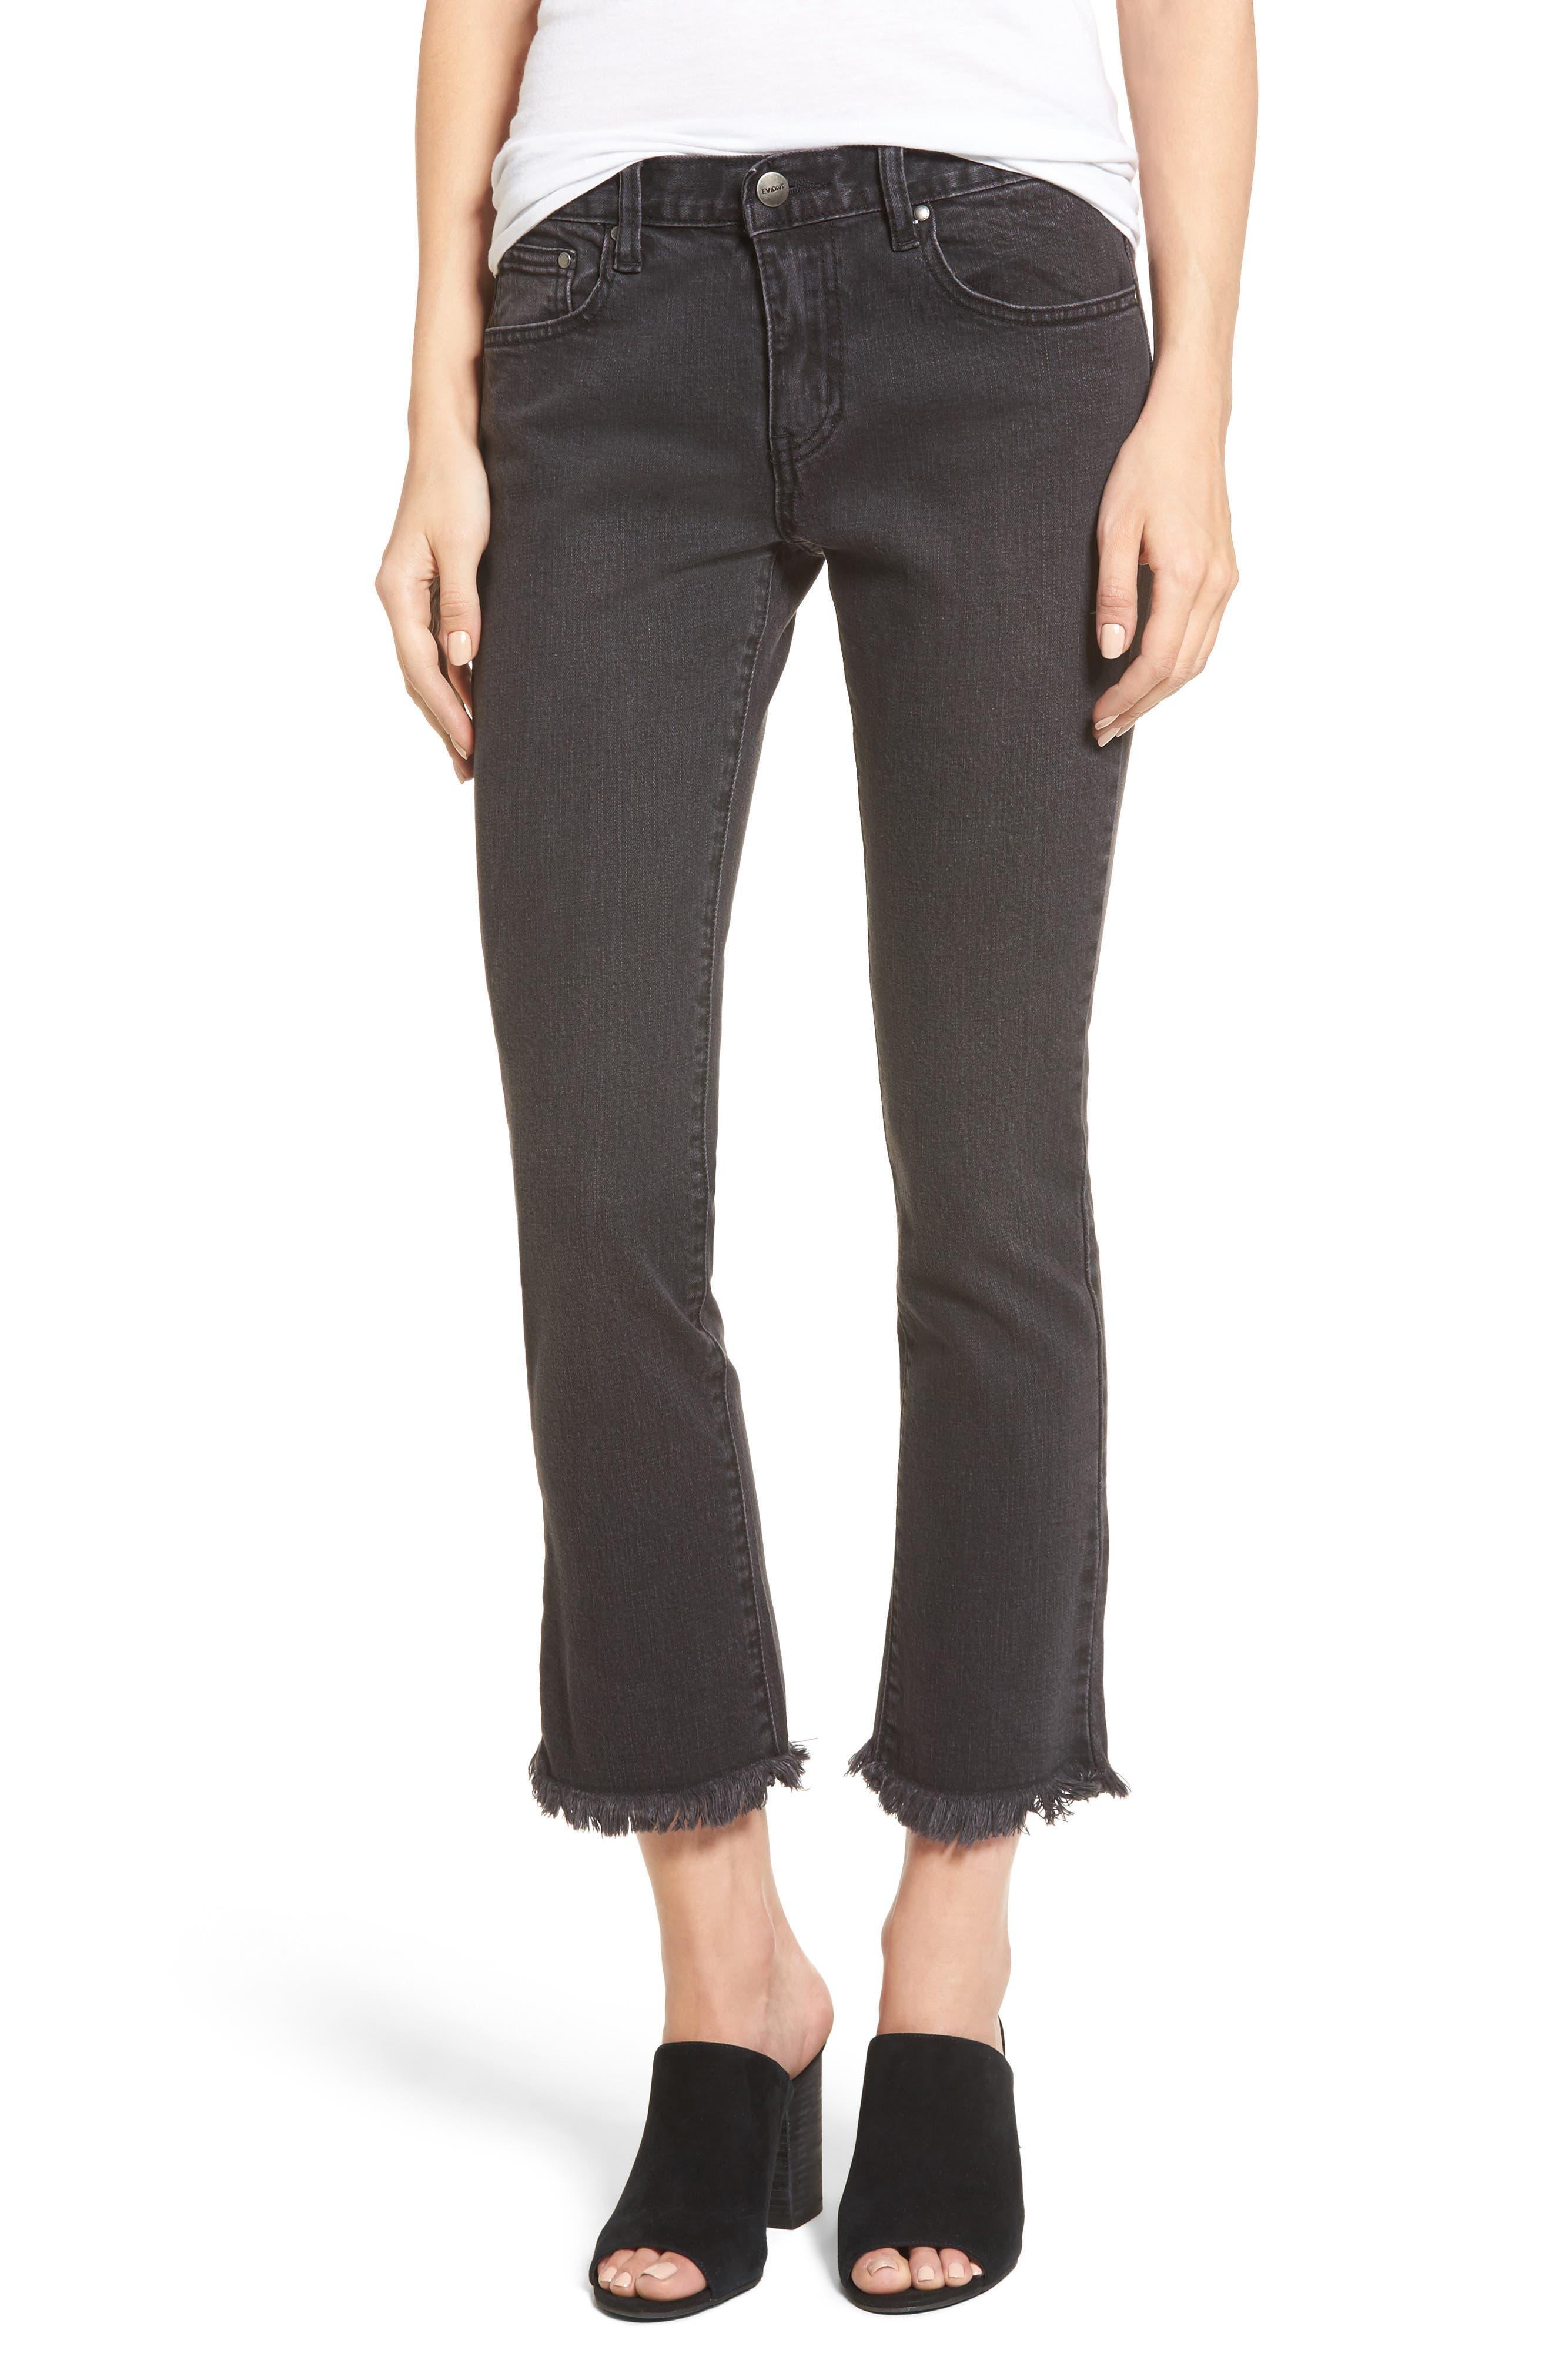 Alternate Image 1 Selected - EVIDNT Hermosa Fray Hem Ankle Skinny Jeans